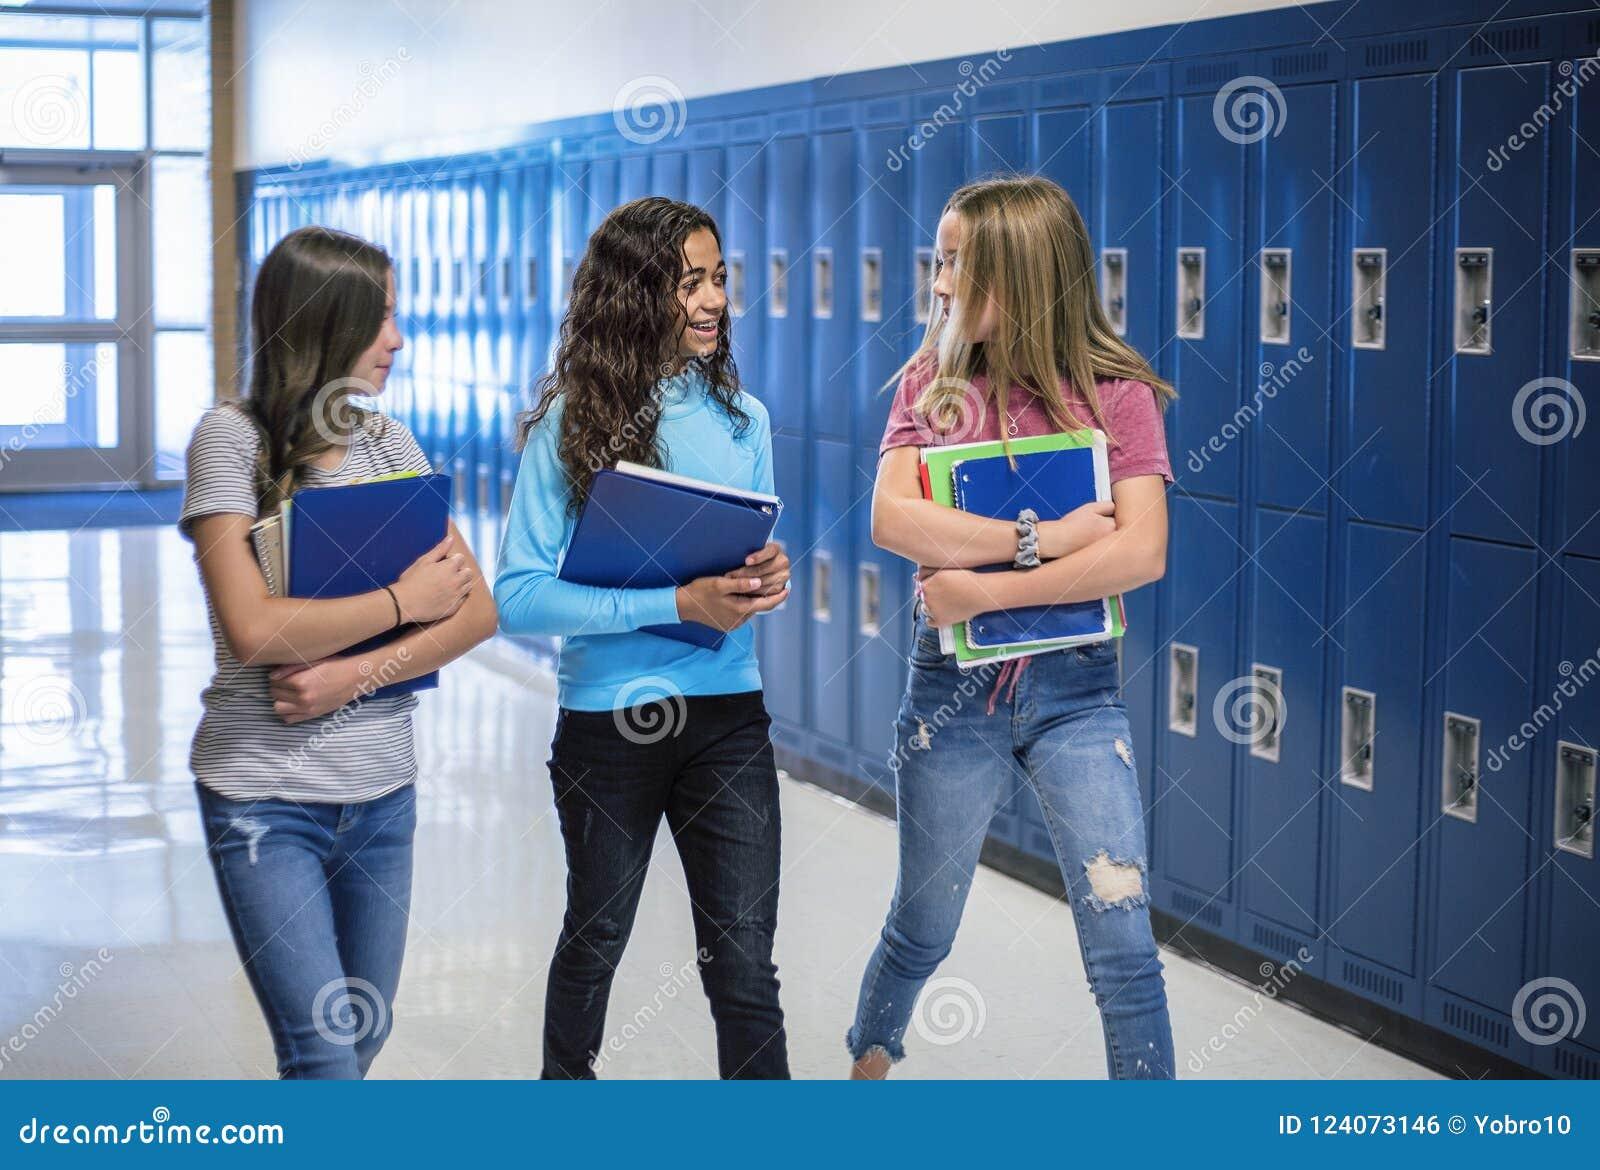 junior high girls candid